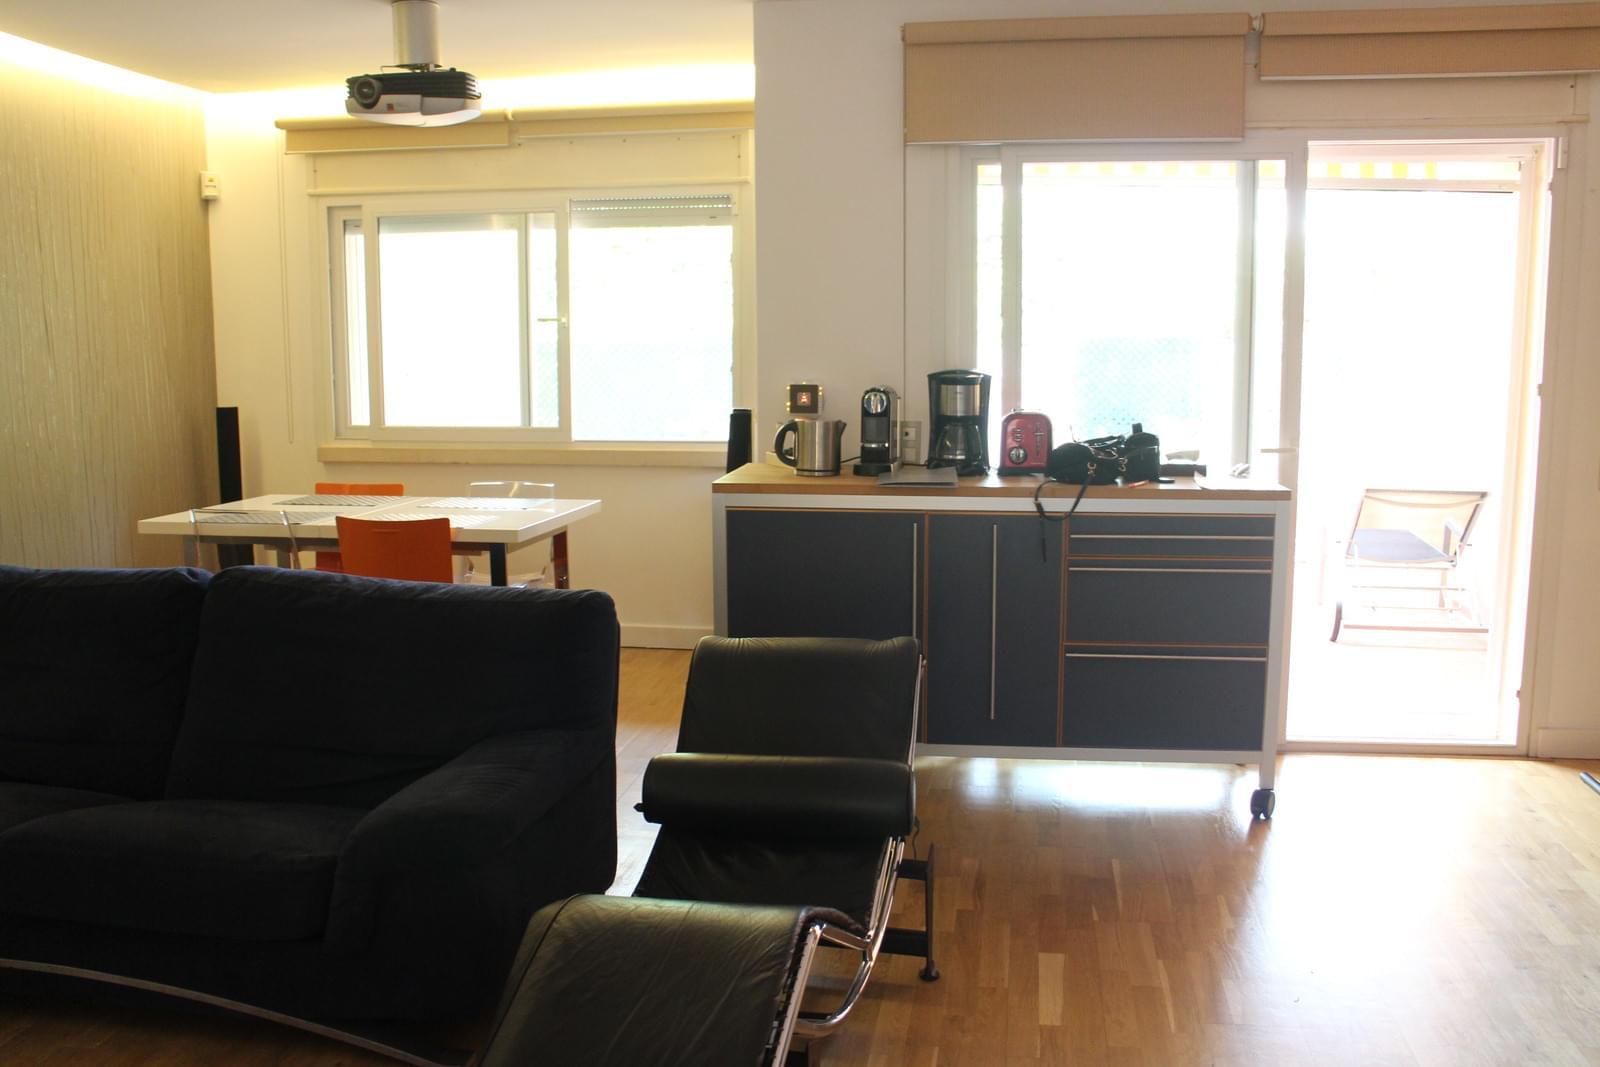 pf17538-apartamento-t2-cascais-d5a0935a-67cf-4893-8bbf-37e5b59fb16c